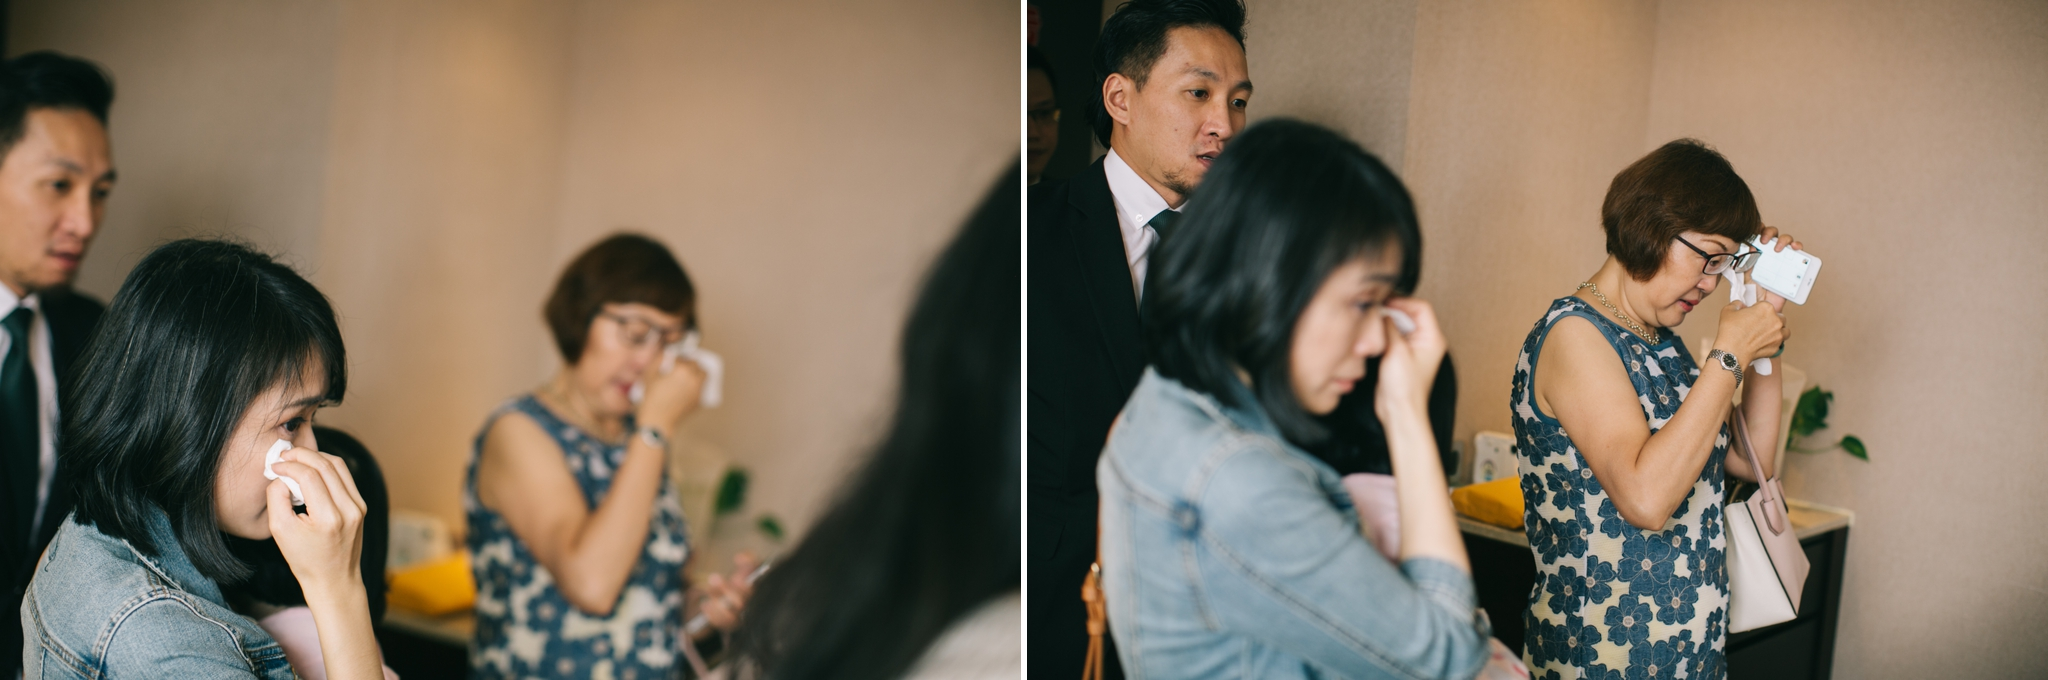 Tina+Nash-wedding-台北婚禮迎娶晚宴-新莊終身大事-062.jpg